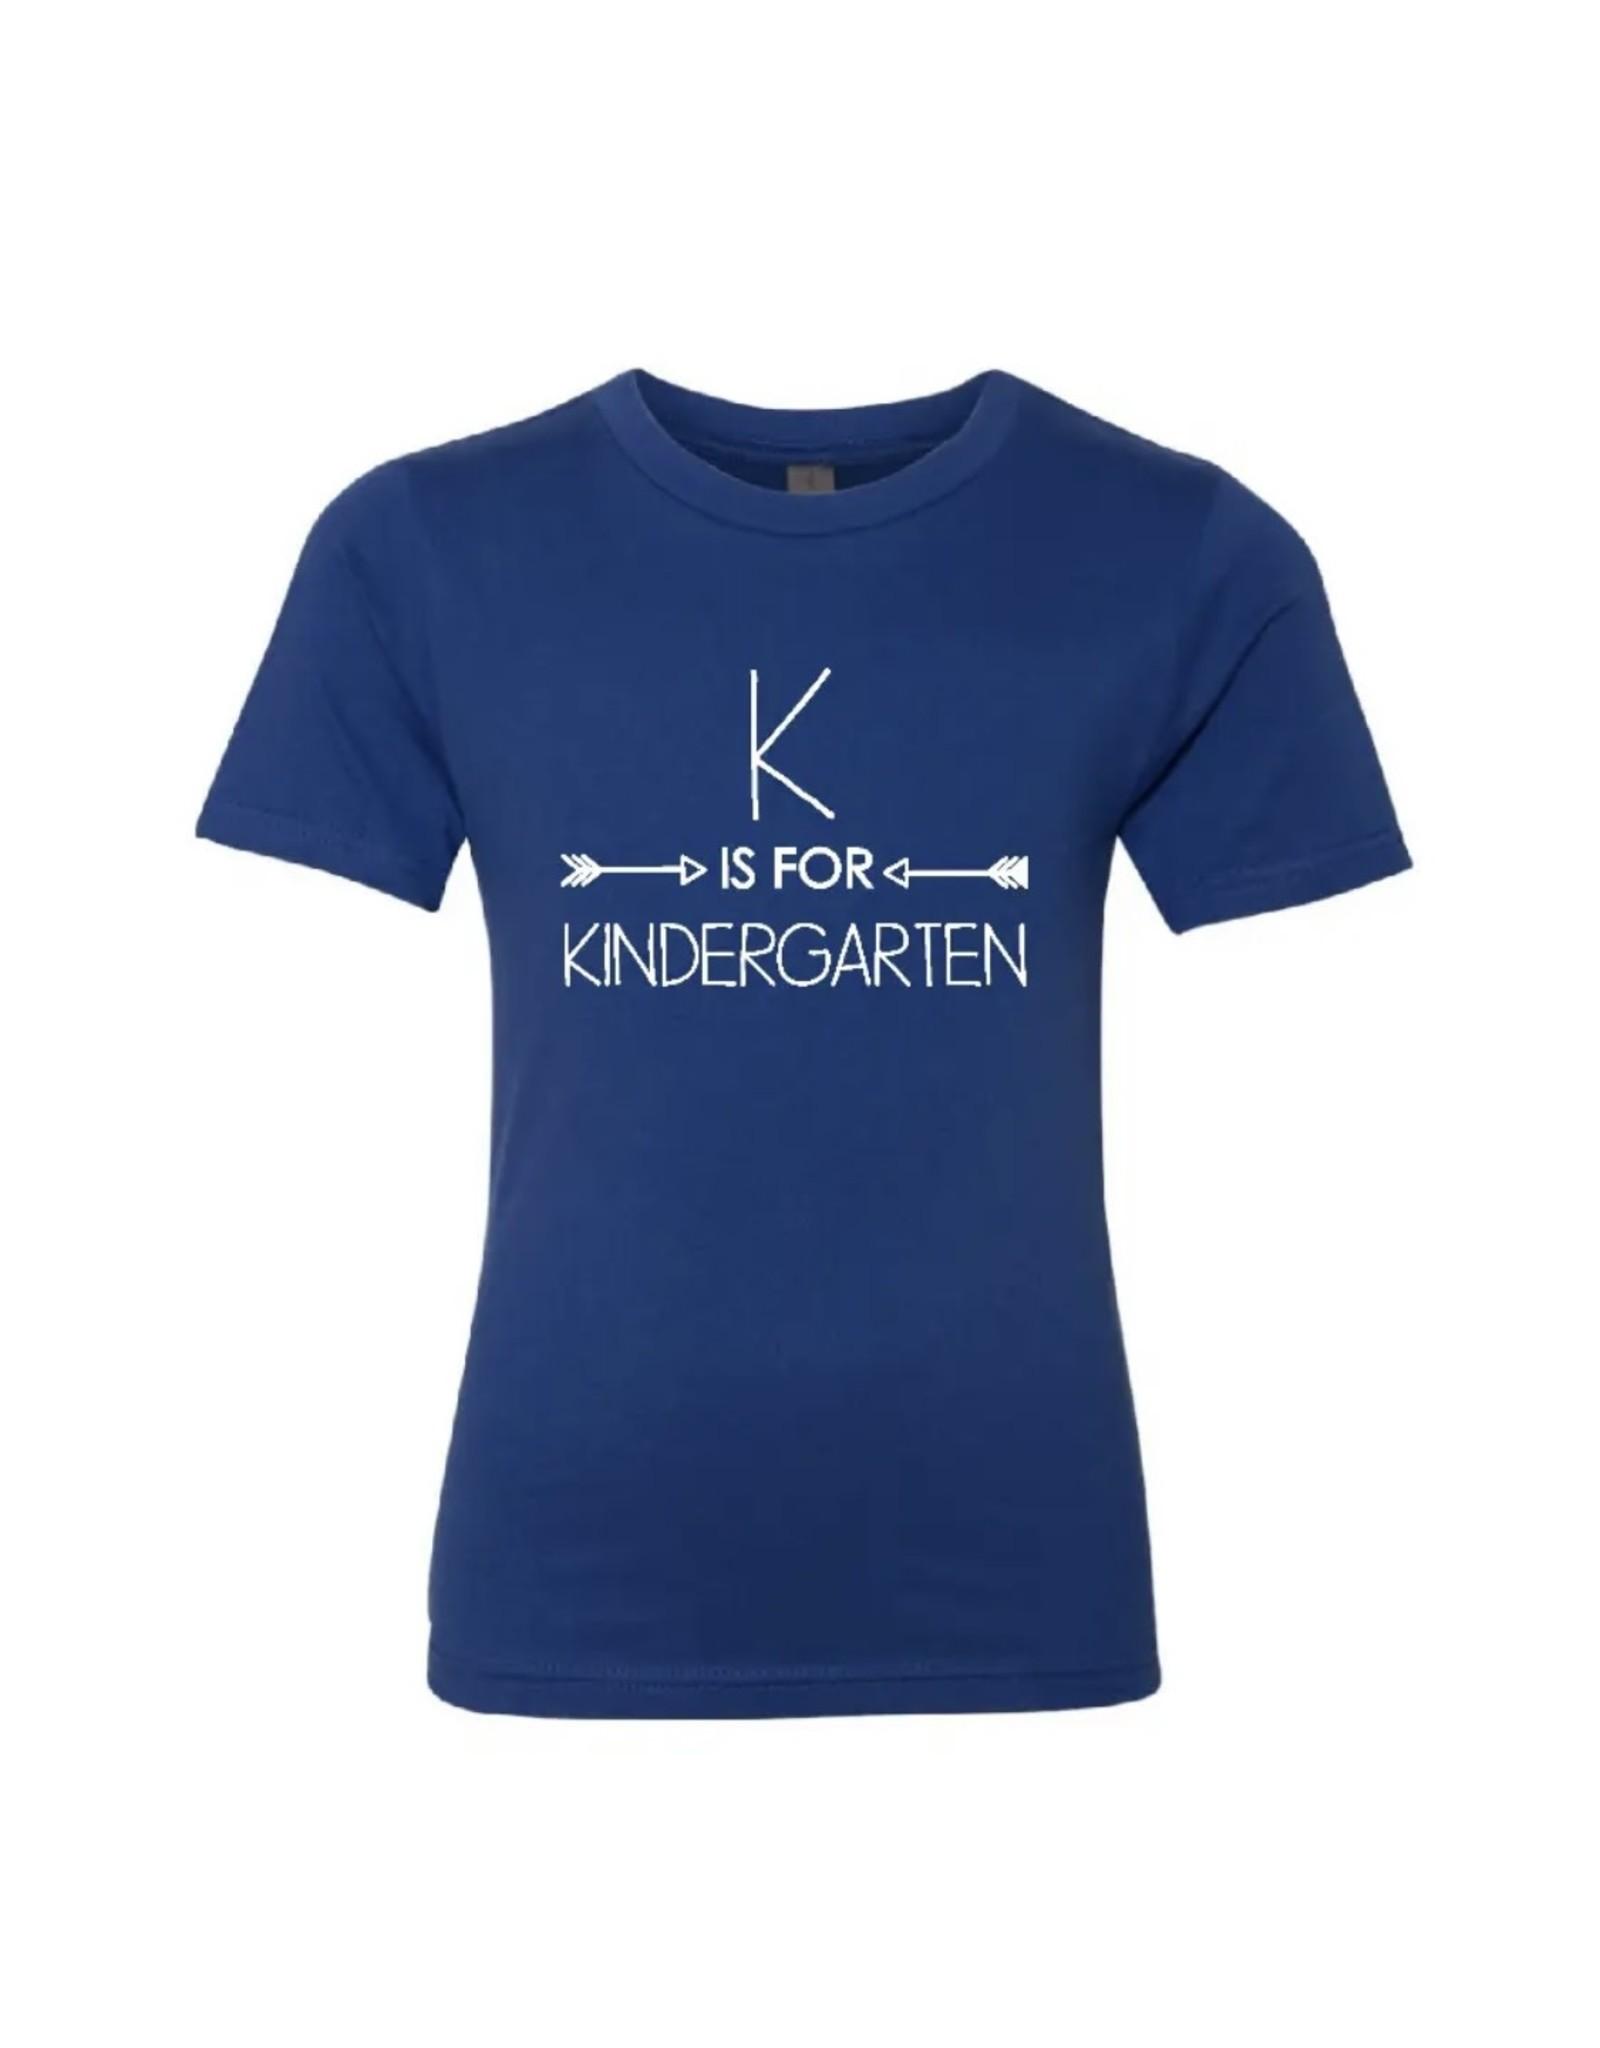 Little Hoot- K is for Kindergarten: Royal